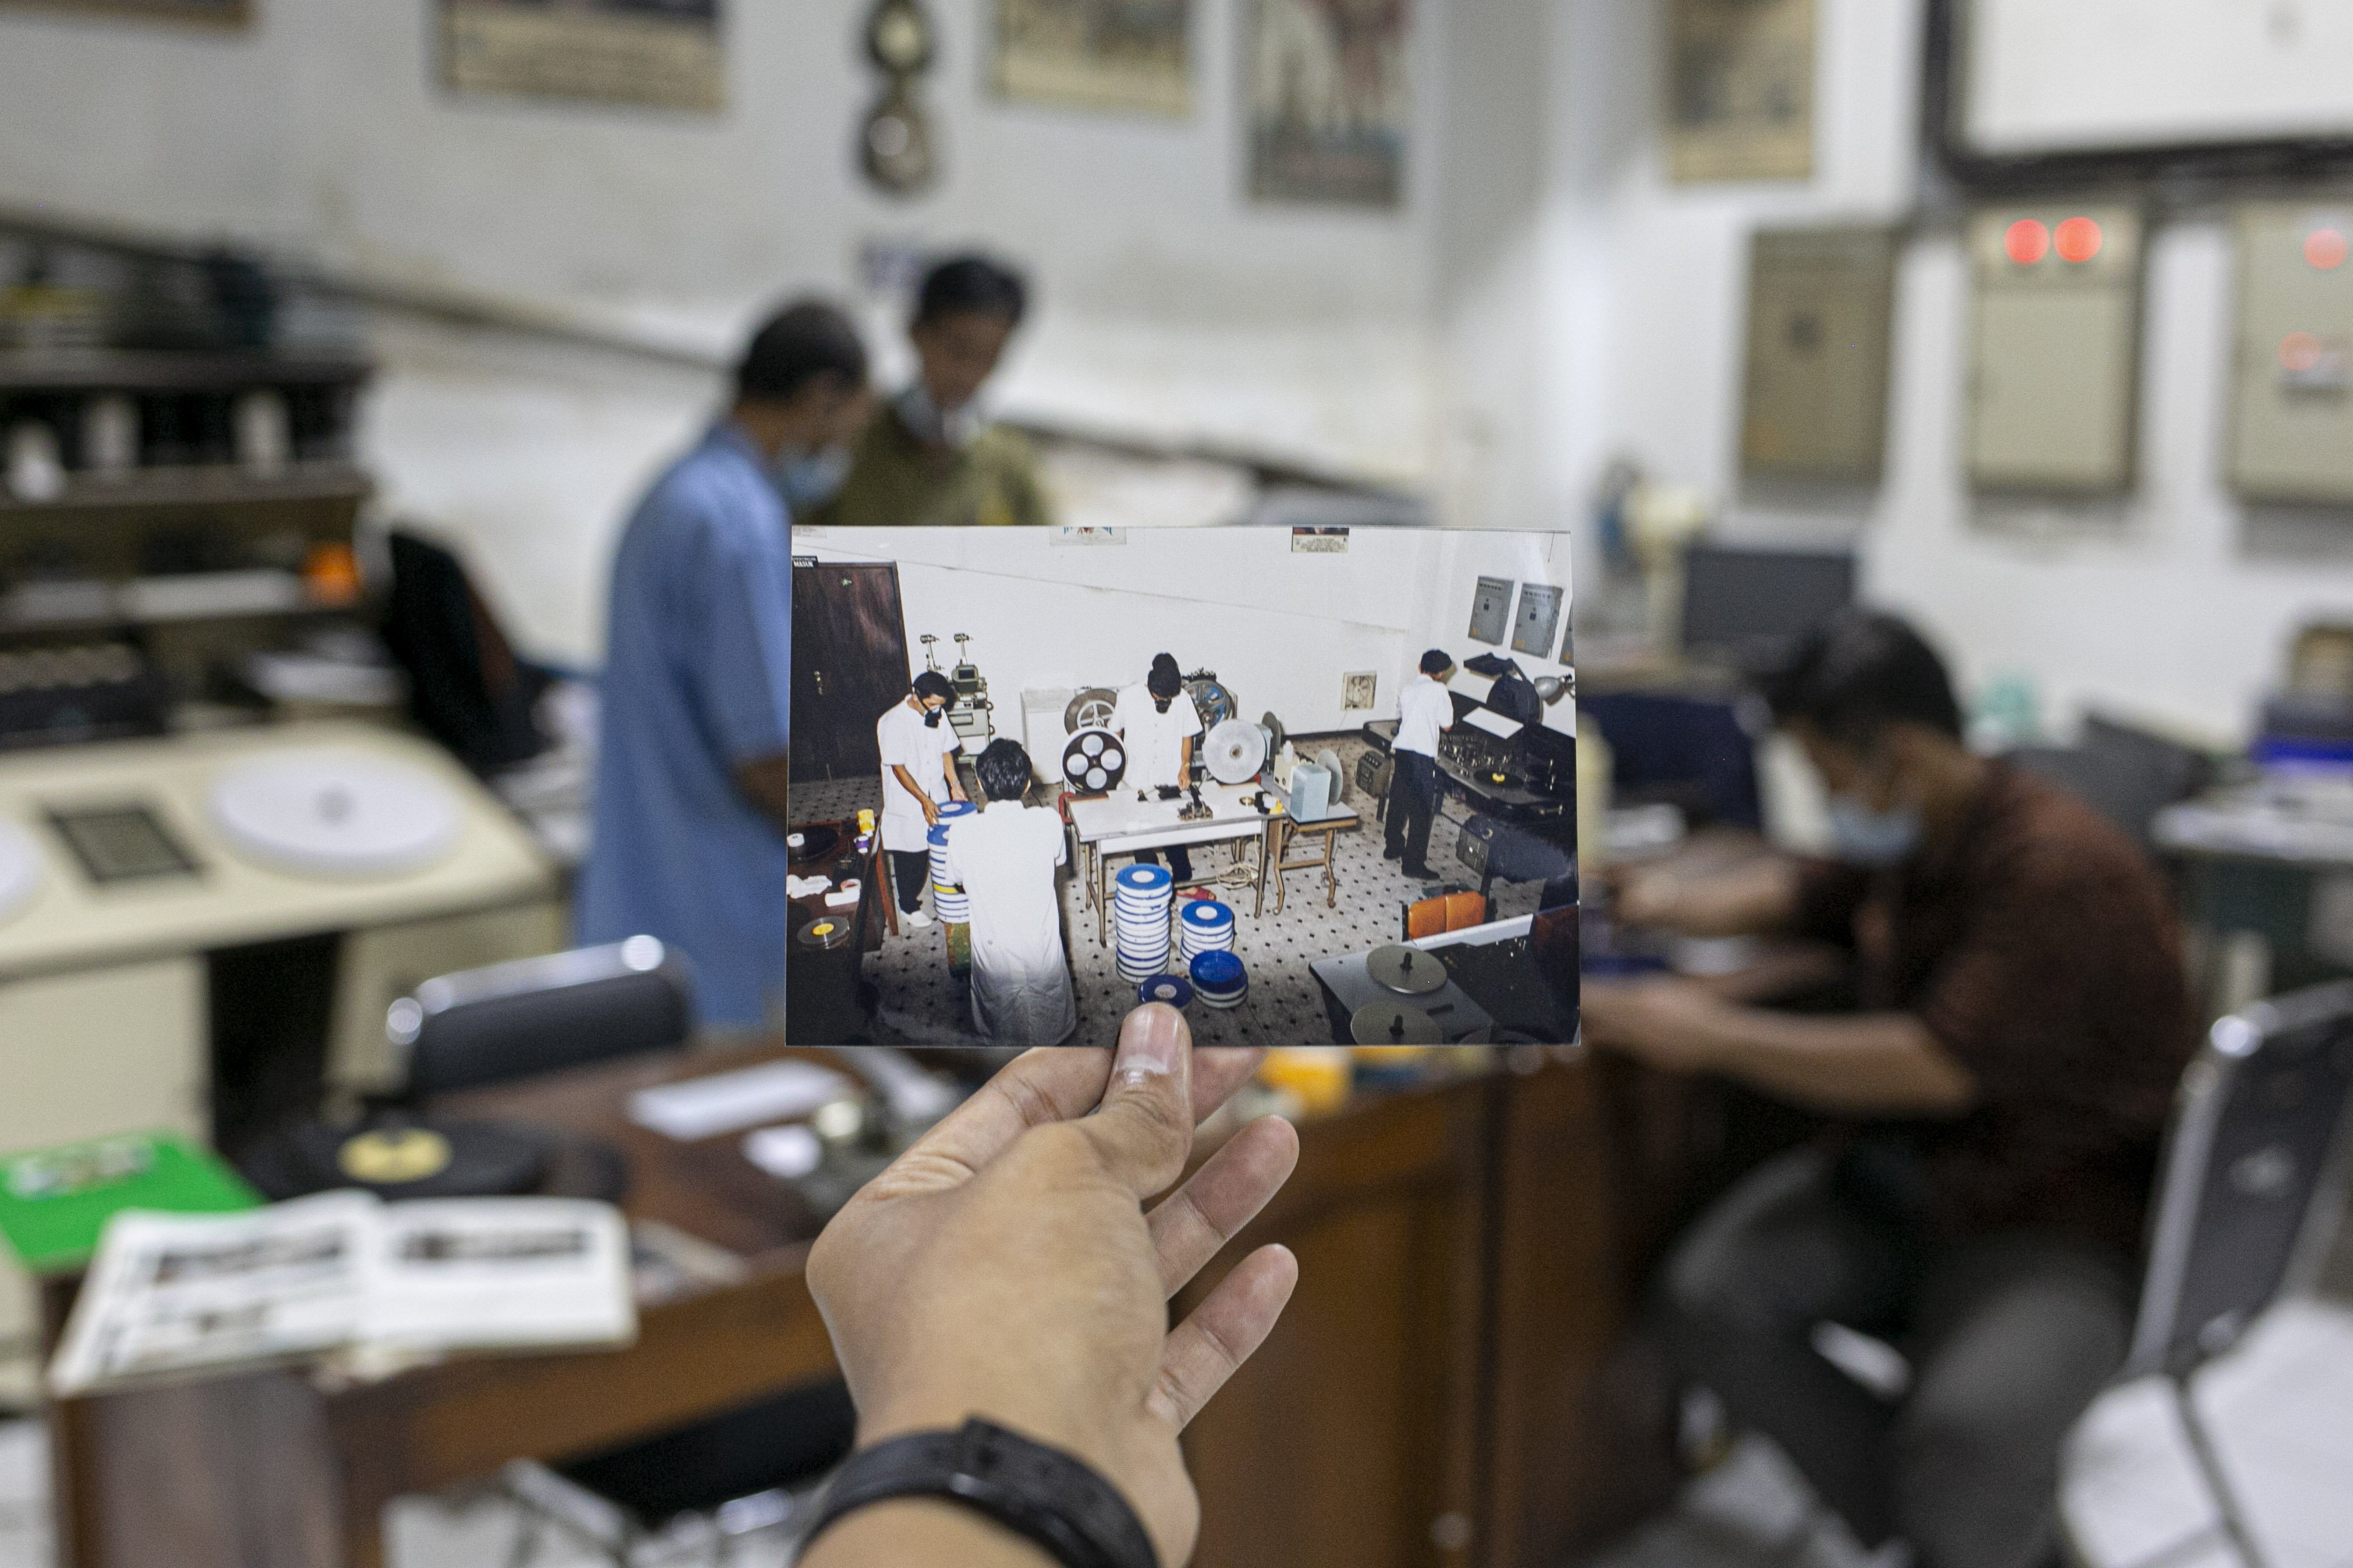 Foto jaman dulu para pekerja merawat gulungan film seluloid di Gedung Sinematek, jalan HR. Rasuna Said, RT.2/RW.5, Karet Kuningan, Kecamatan Setiabudi, Kota Jakarta Selatan.